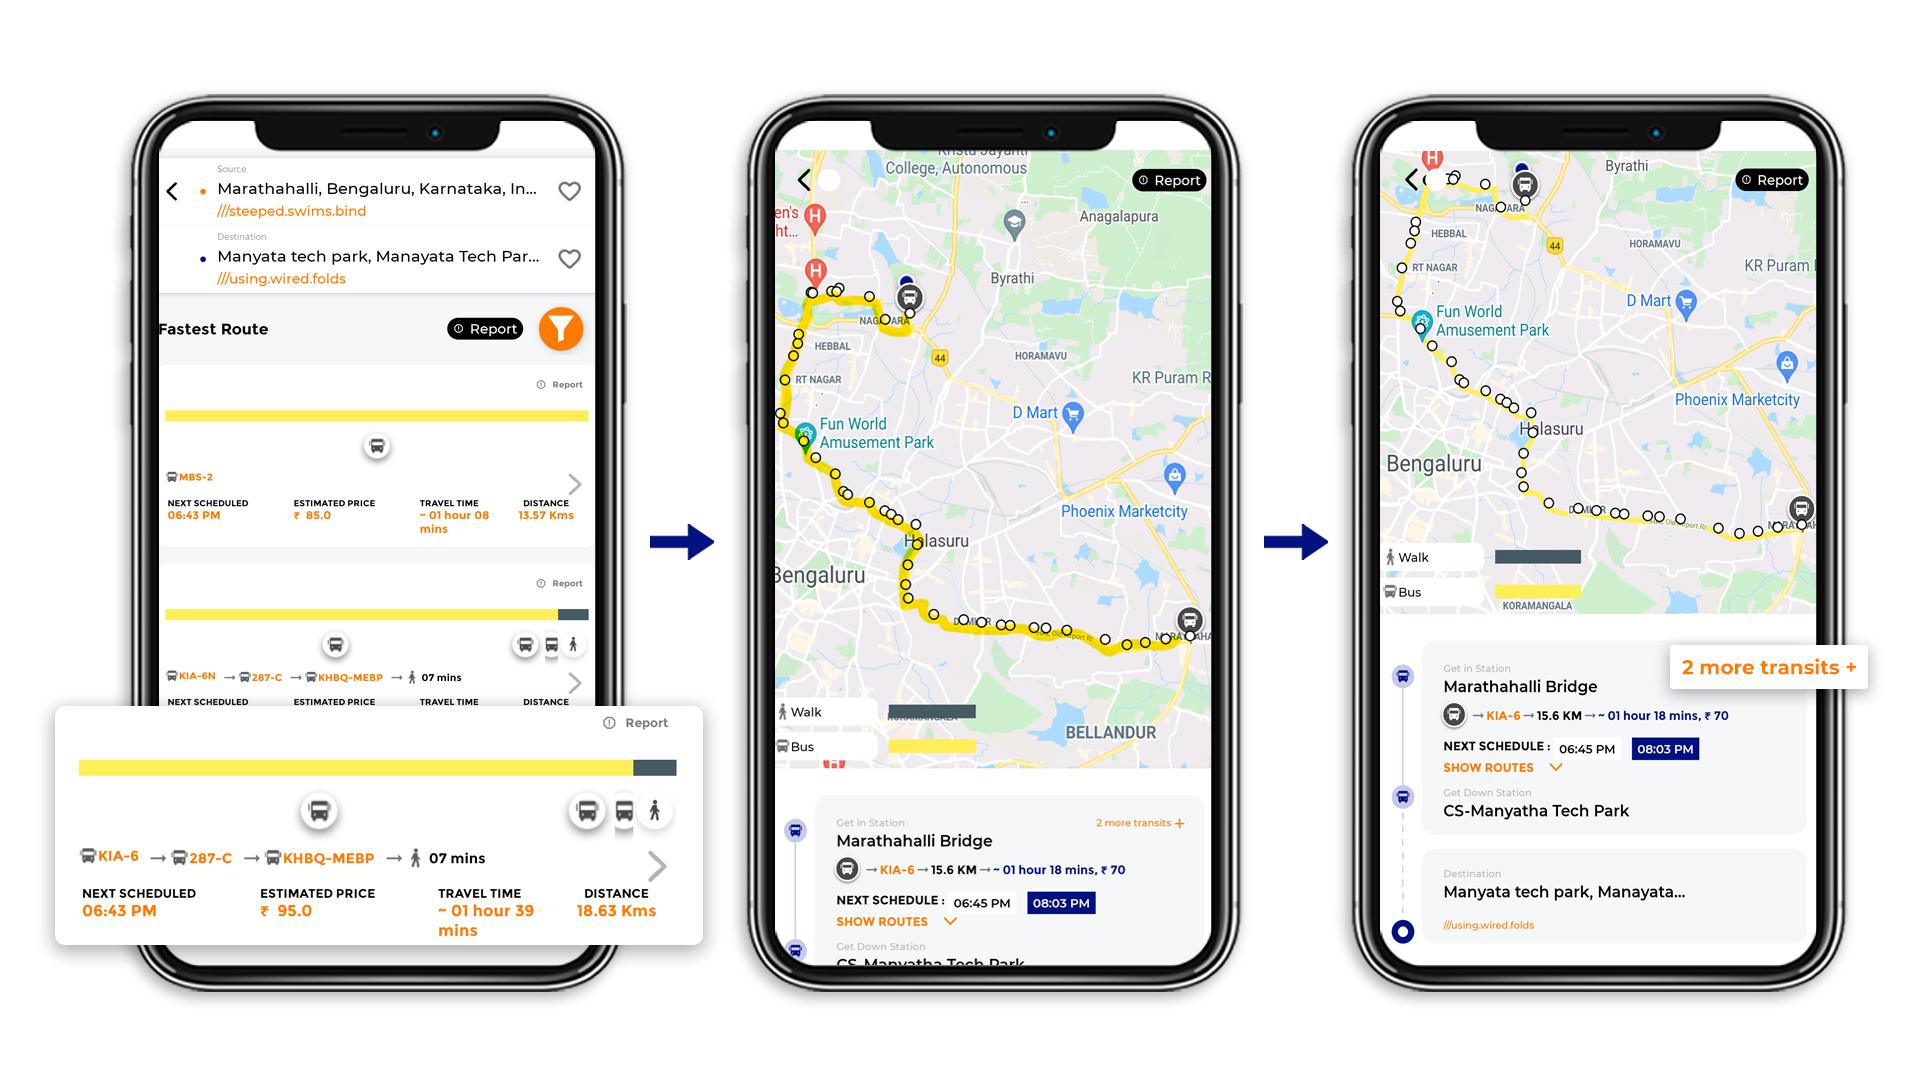 Tummoc, Tummoc app, Marathahalli, Manyata Tech park, Public transport